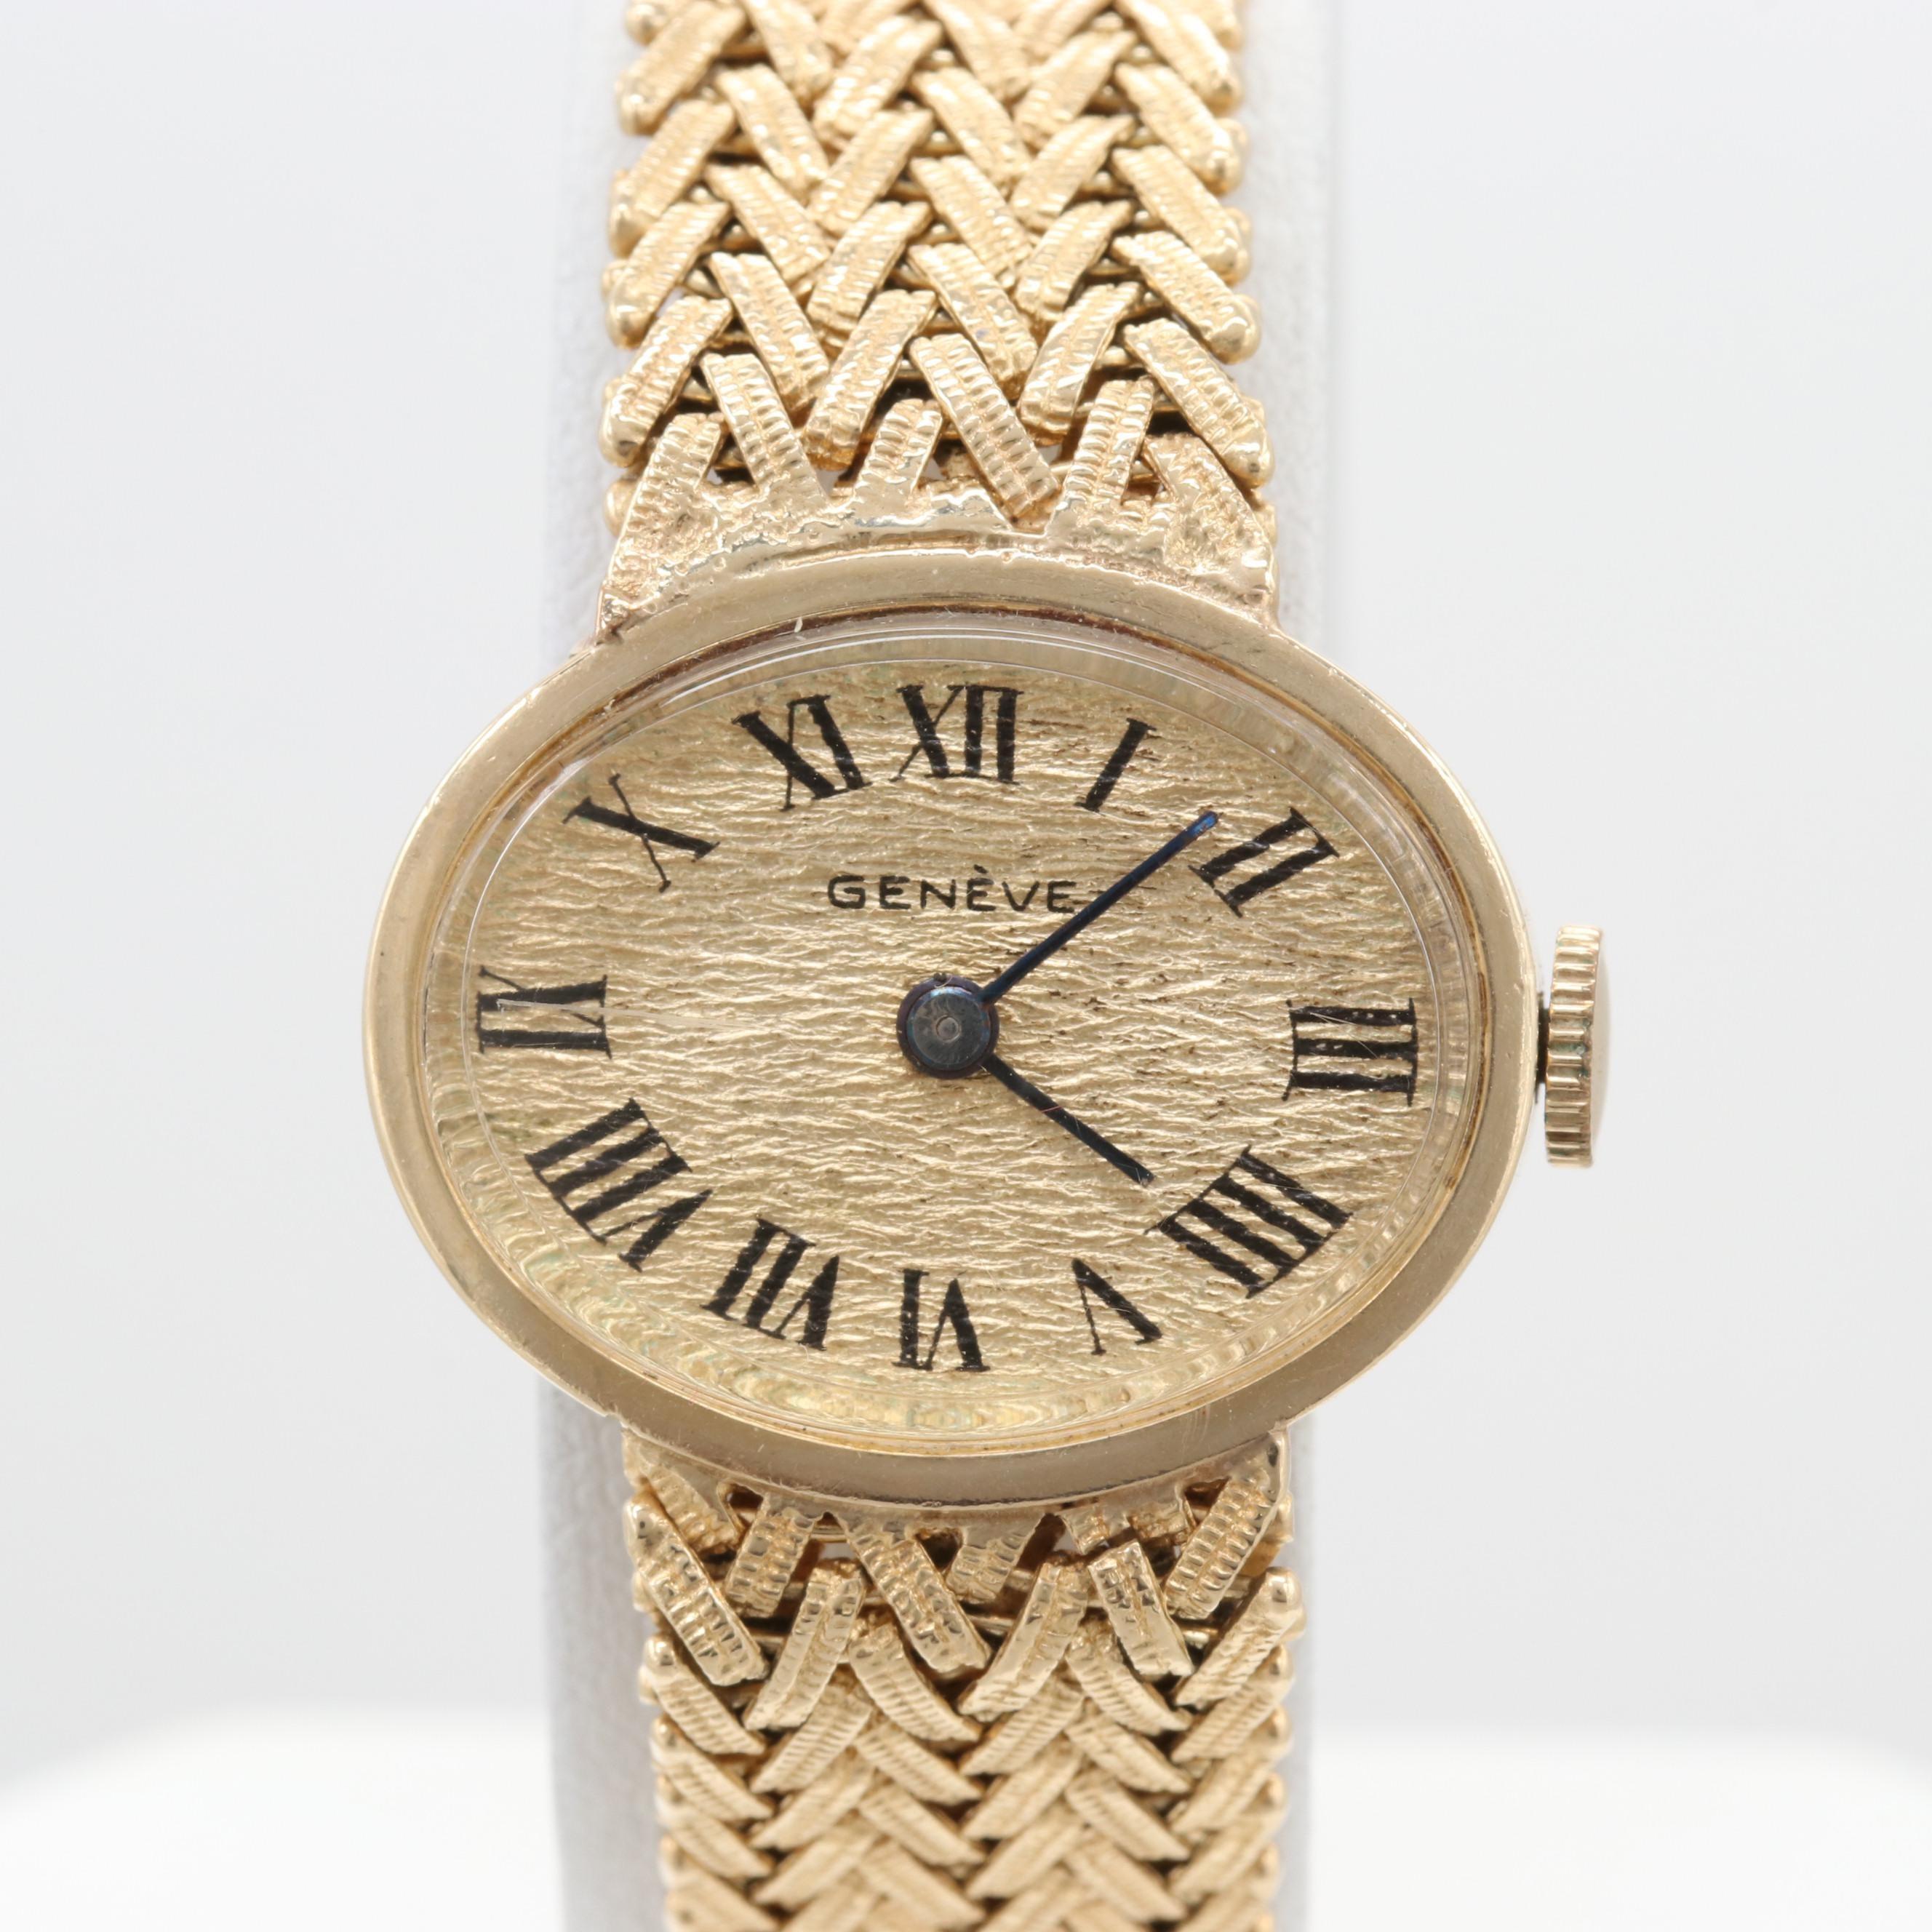 Geneva 14K Yellow Gold Stem Wind Wristwatch